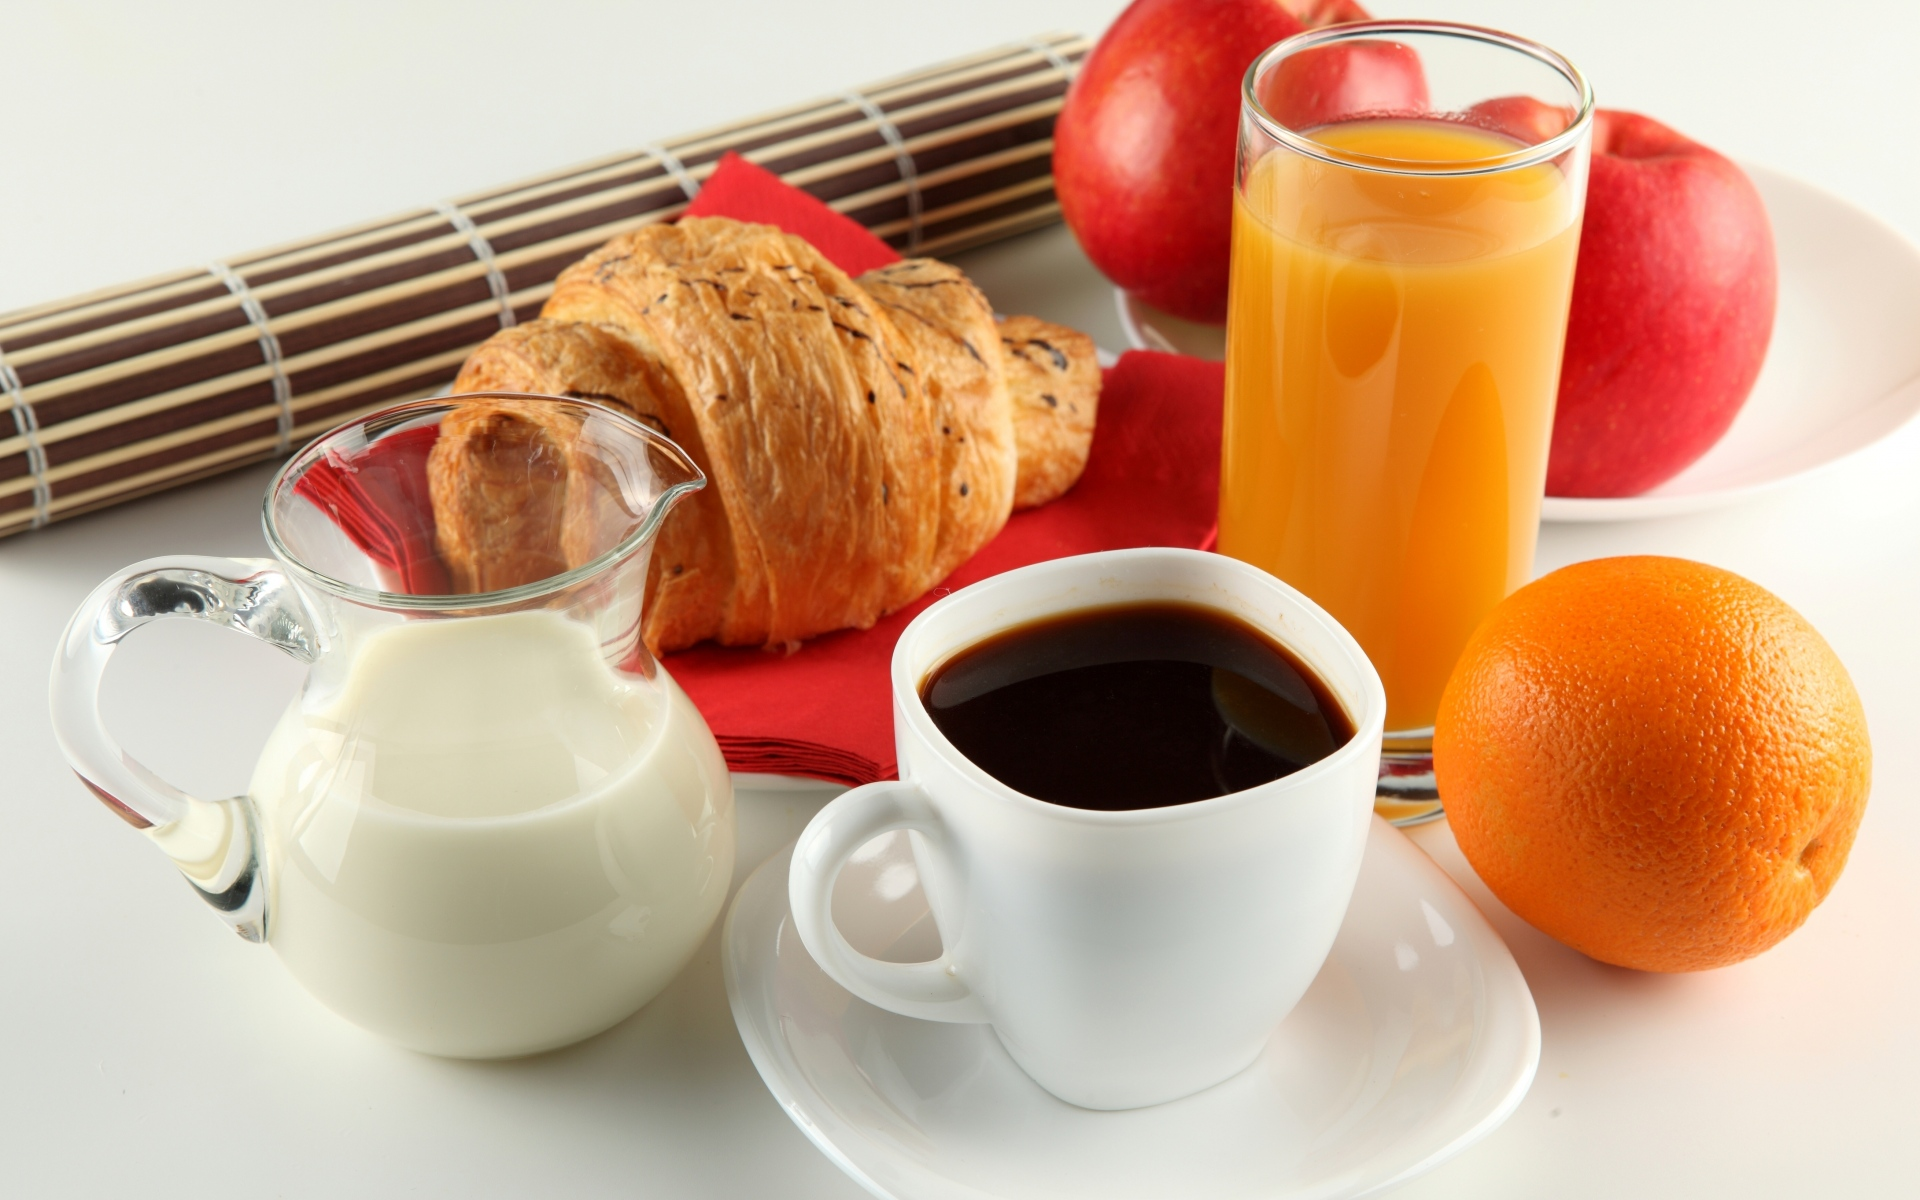 Картинки Завтрак, кофе, молоко, апельсин, сок, круассан, яблоко, чашка, белый, блюдце, кувшин фото и обои на рабочий стол